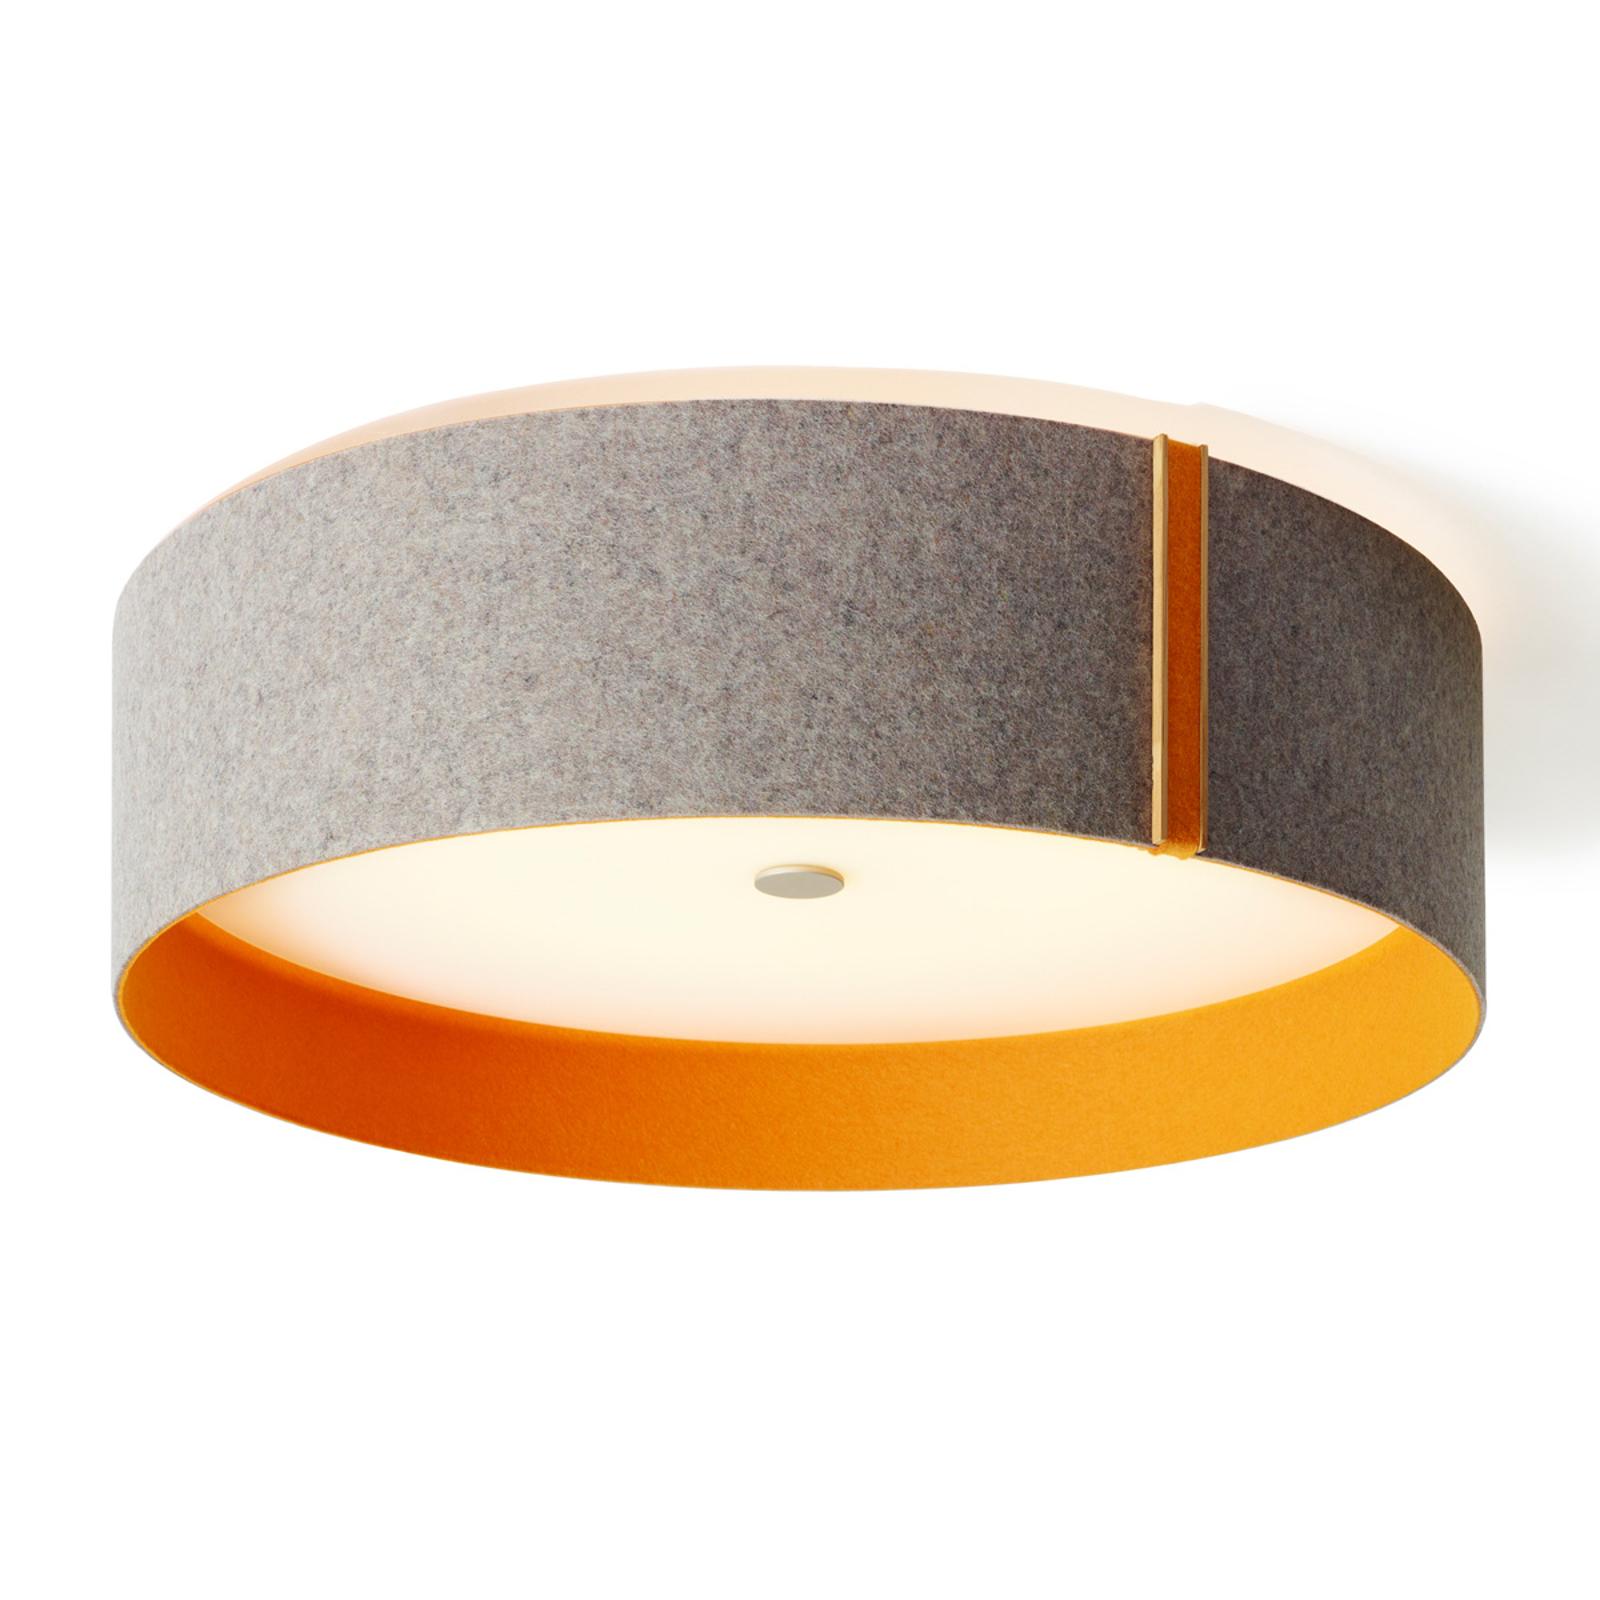 Lara felt - plafoniera LED feltro grigio-arancione